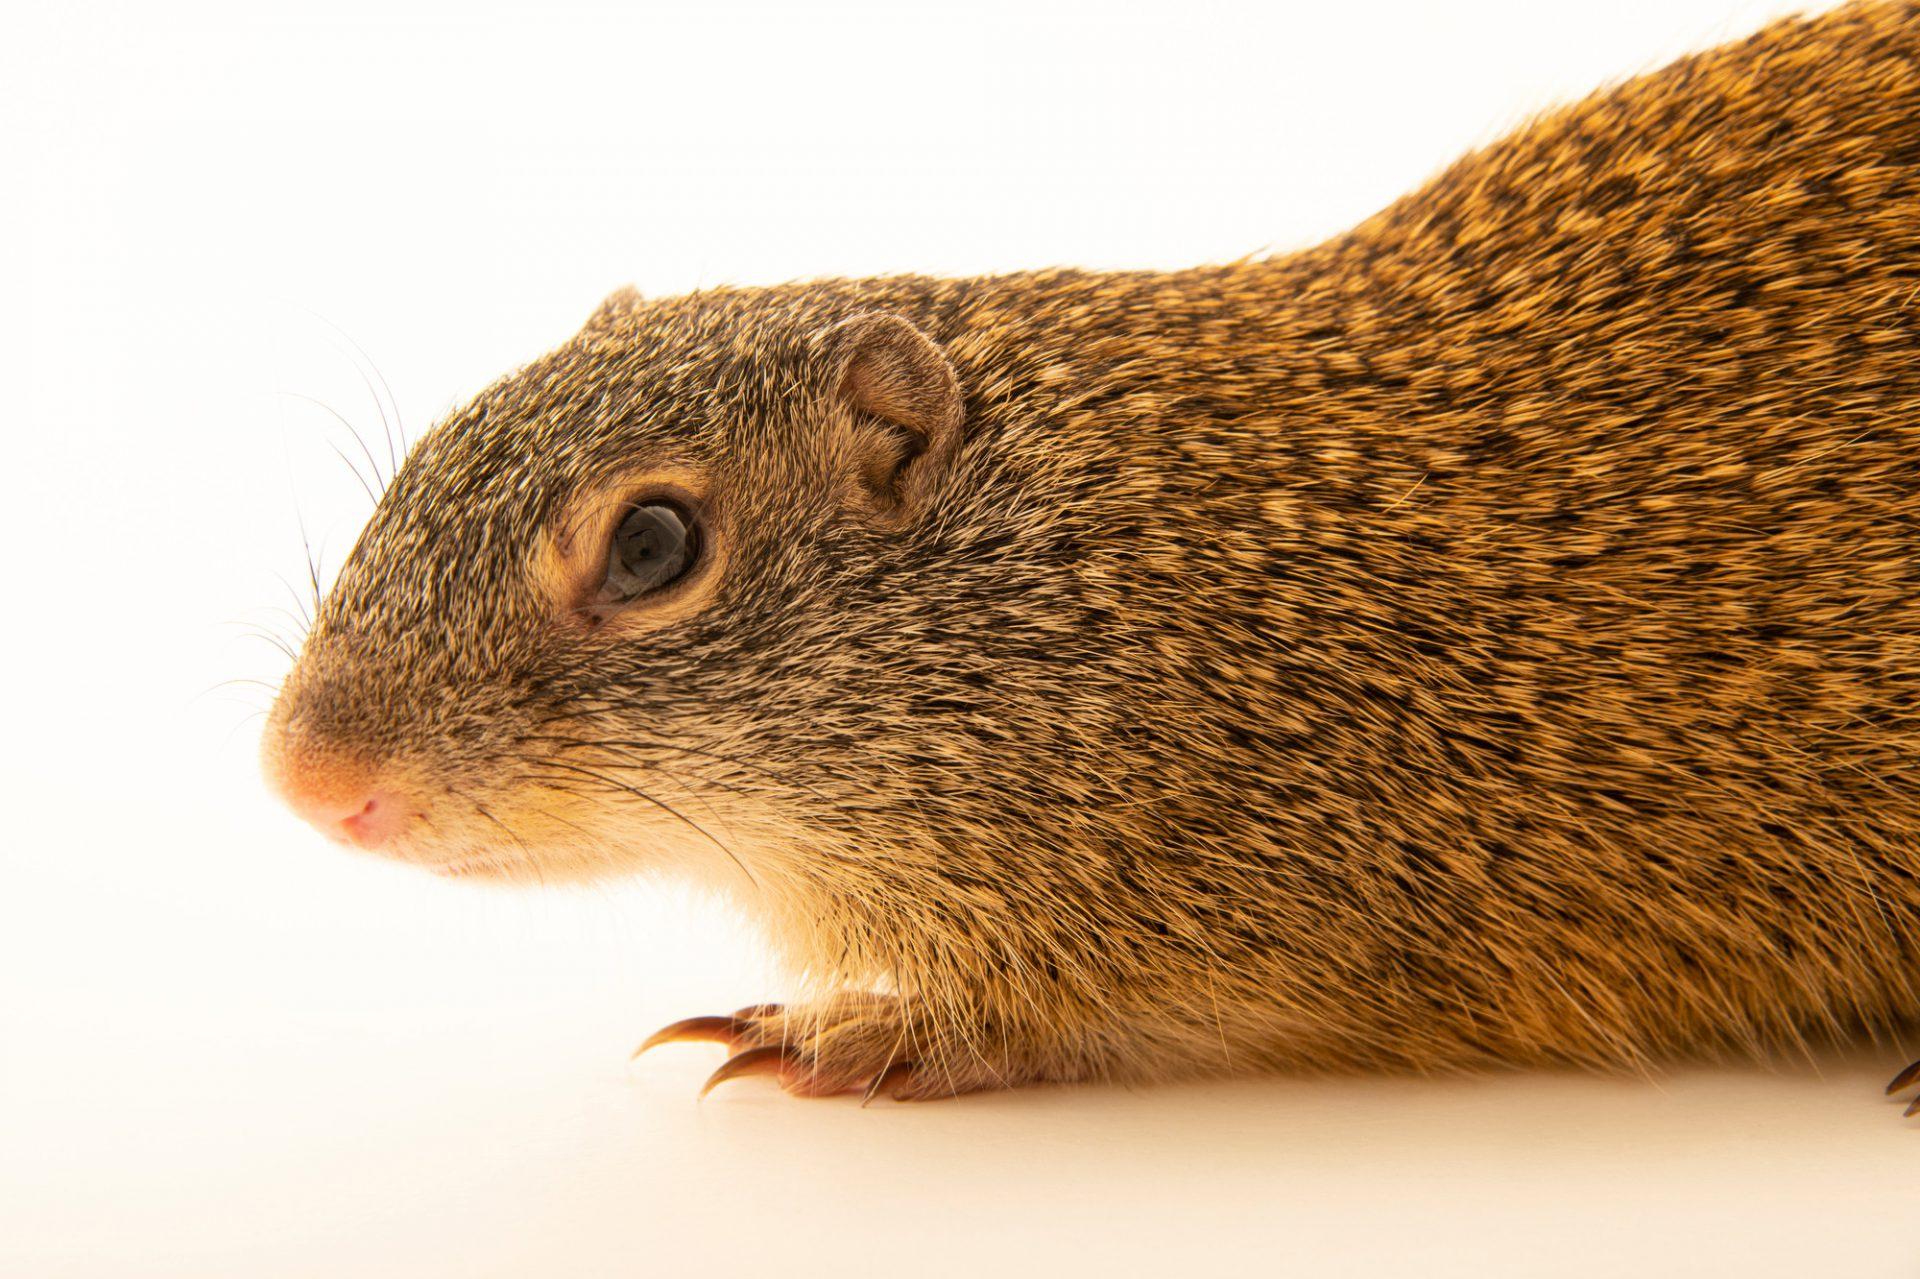 Photo: A FranklinÕs ground squirrel (Poliocitellus franklinii) at the Wildlife Rescue Center of Minnesota.